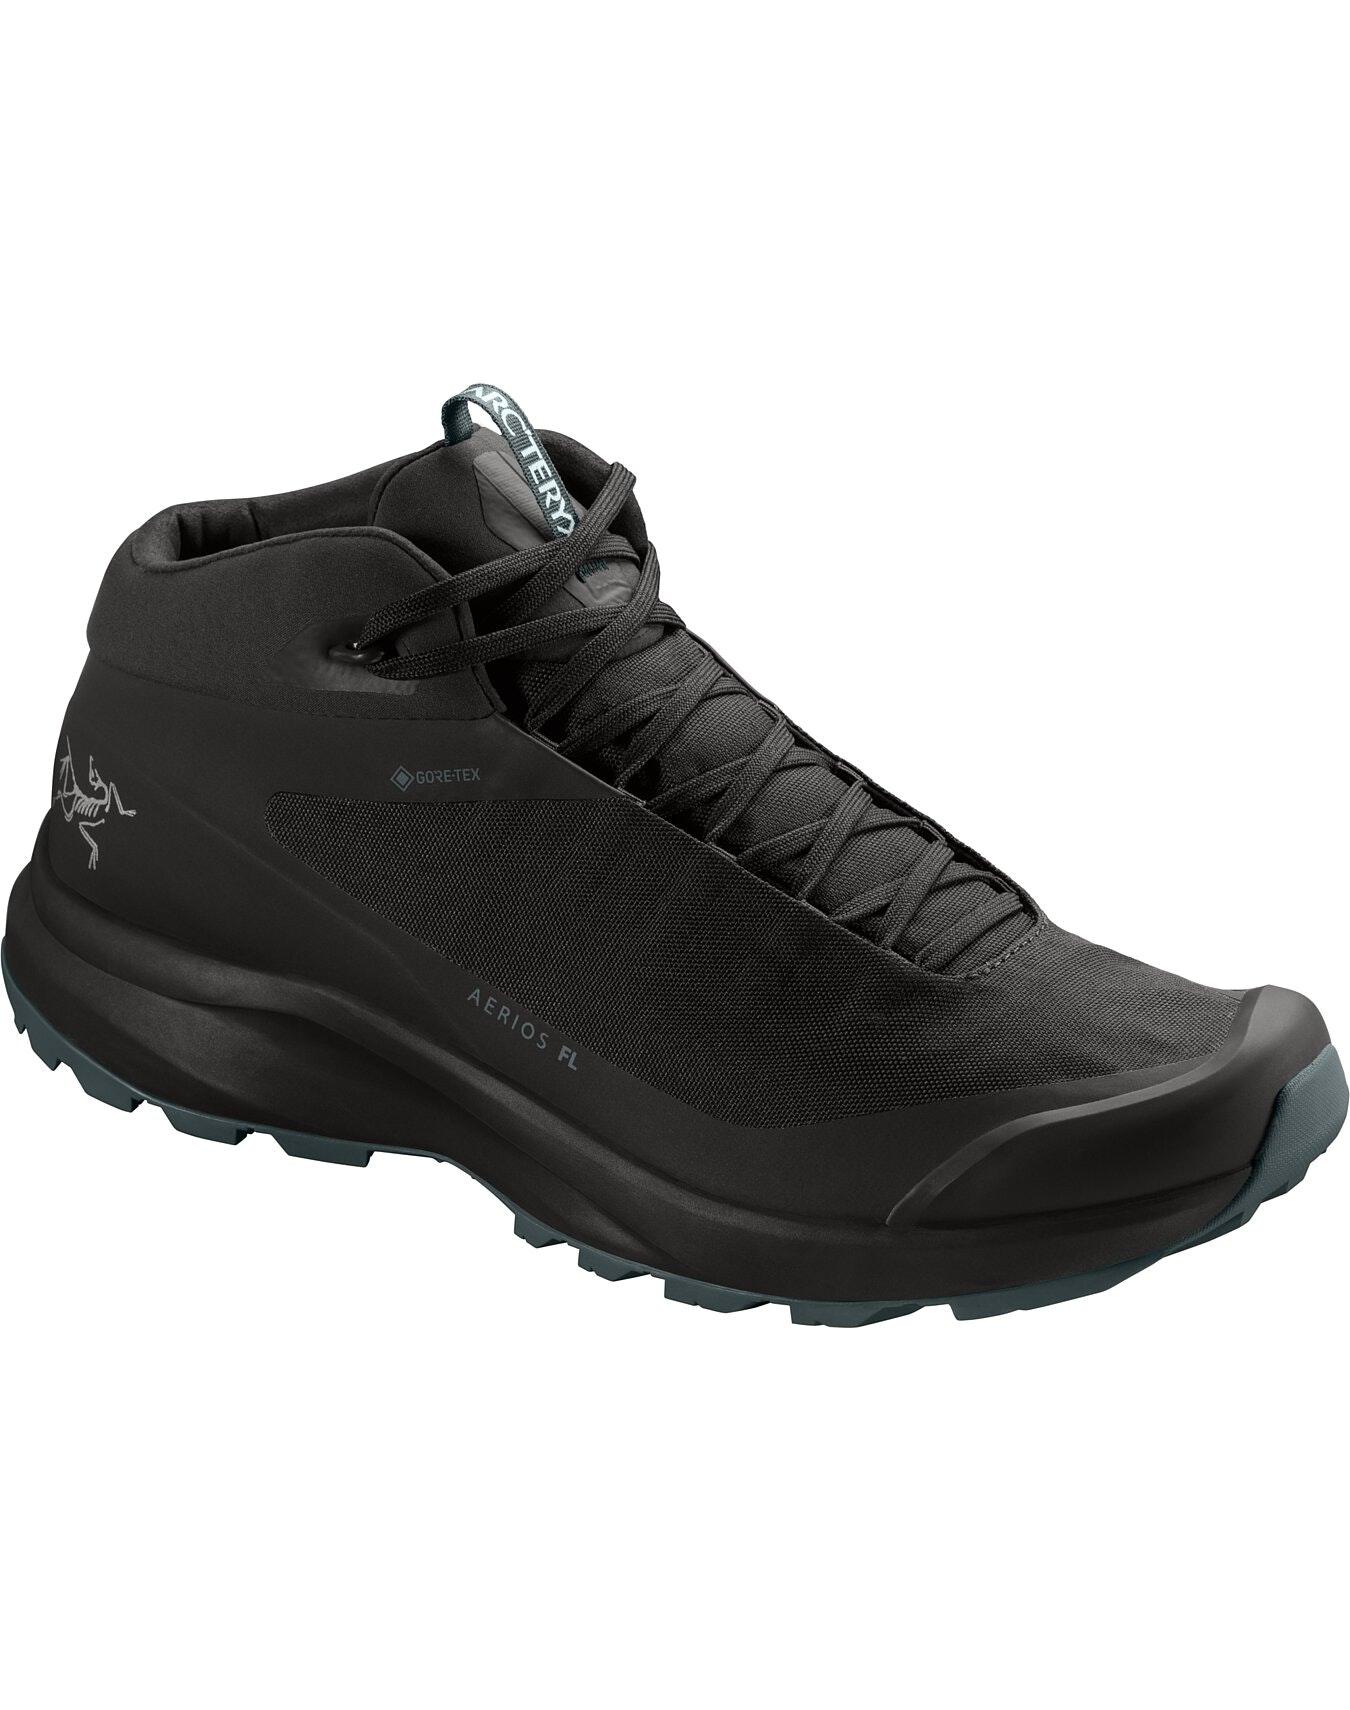 Aerios FL Mid GTX Shoe Black/CINDER